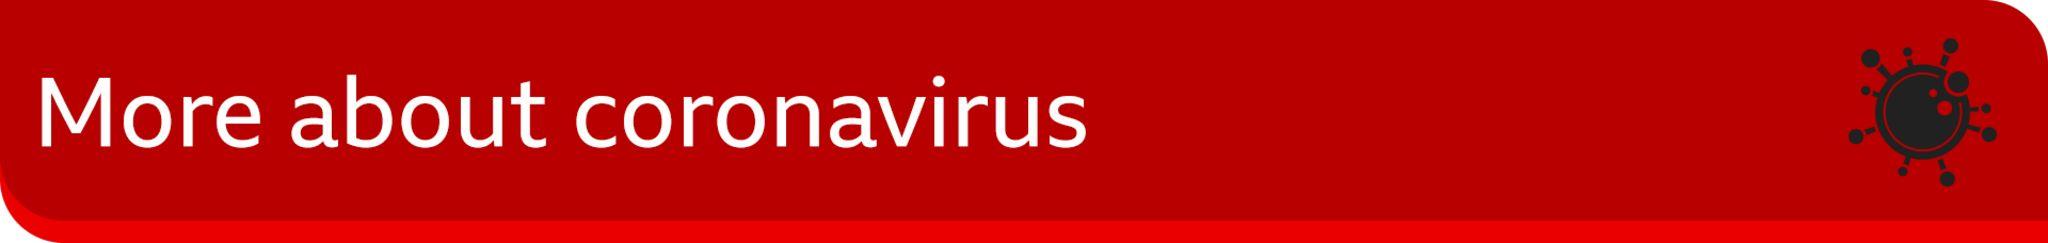 Banner image reading 'more about coronavirus'